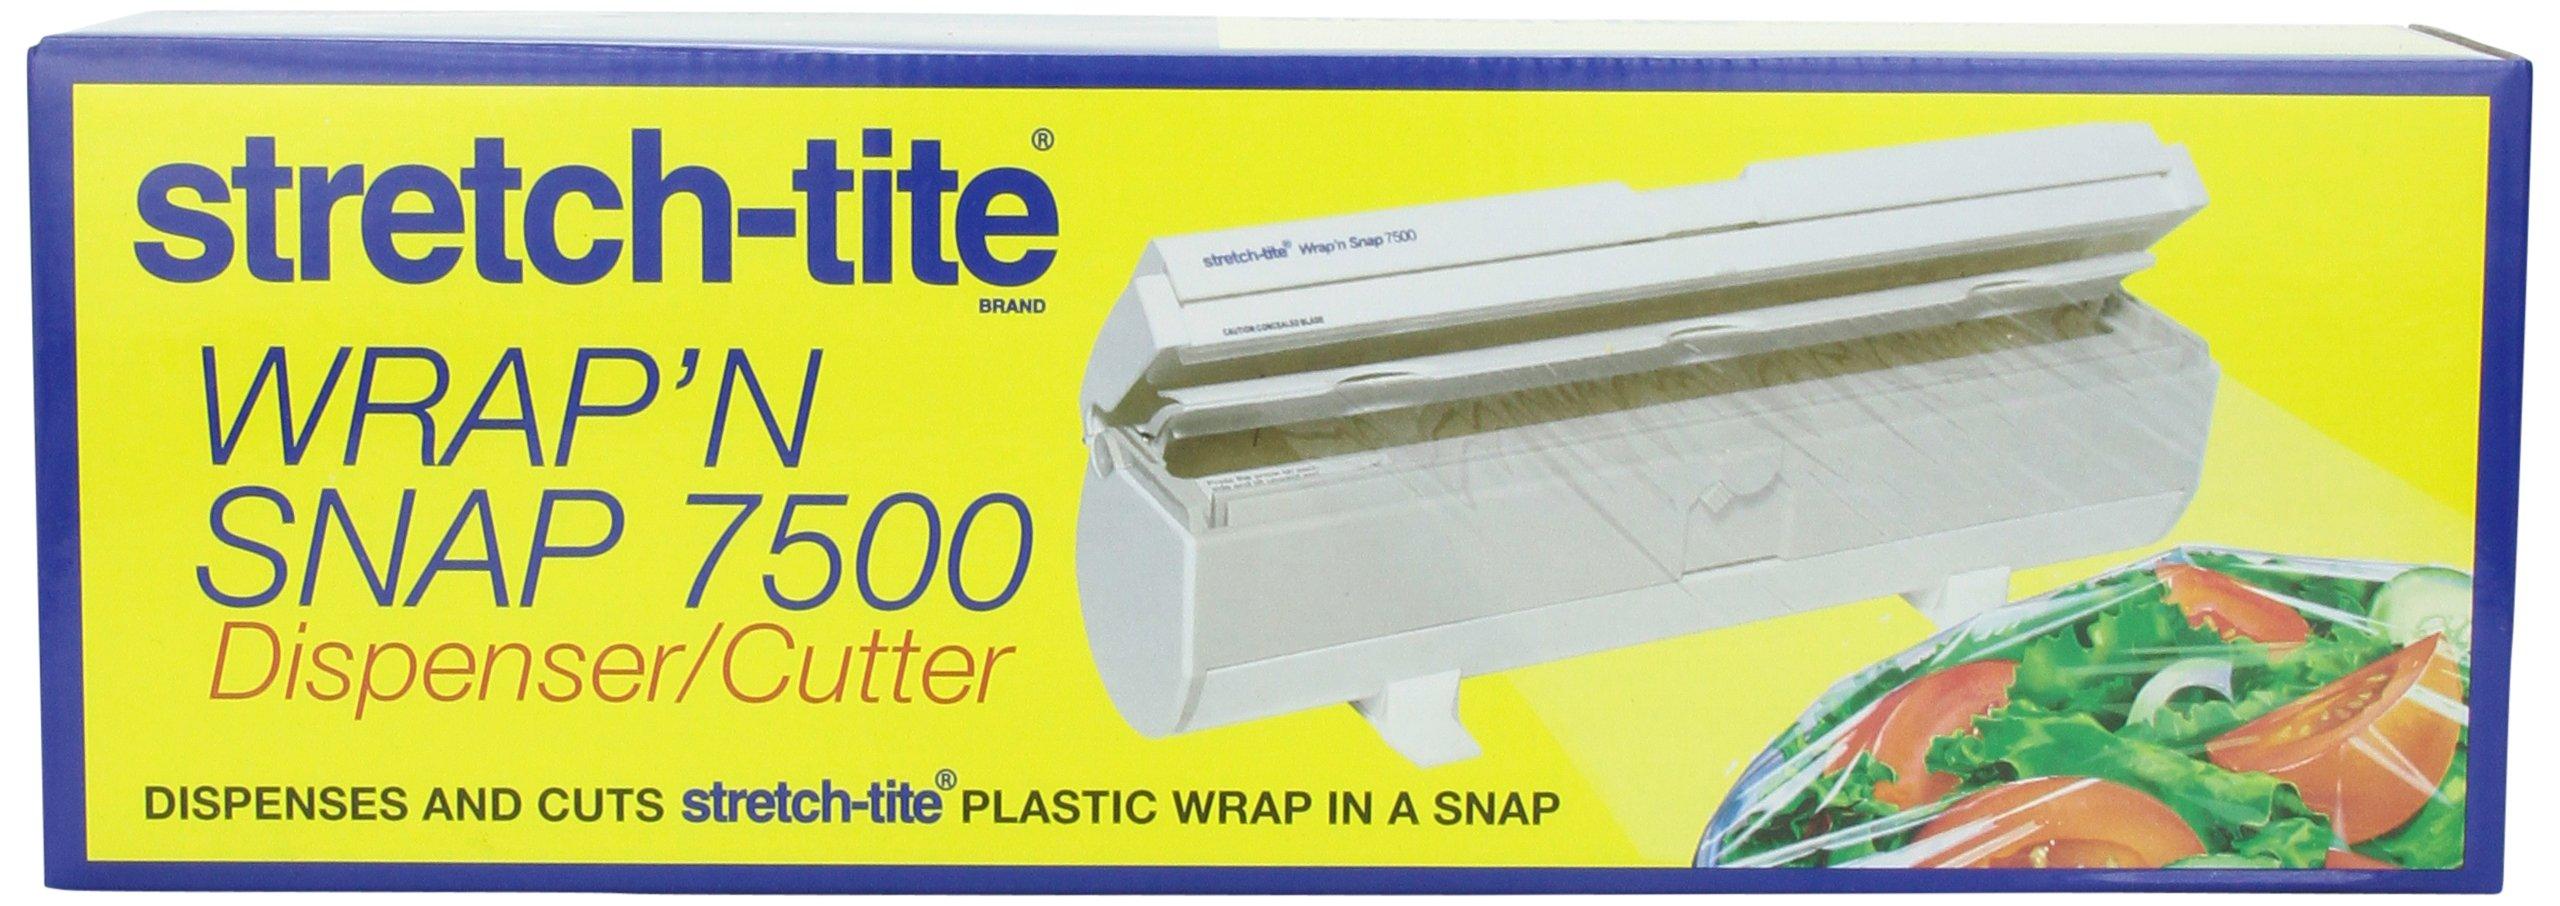 Stretch-tite Wrap'N Snap 7500 Dispenser by Polyvinyl Films Inc